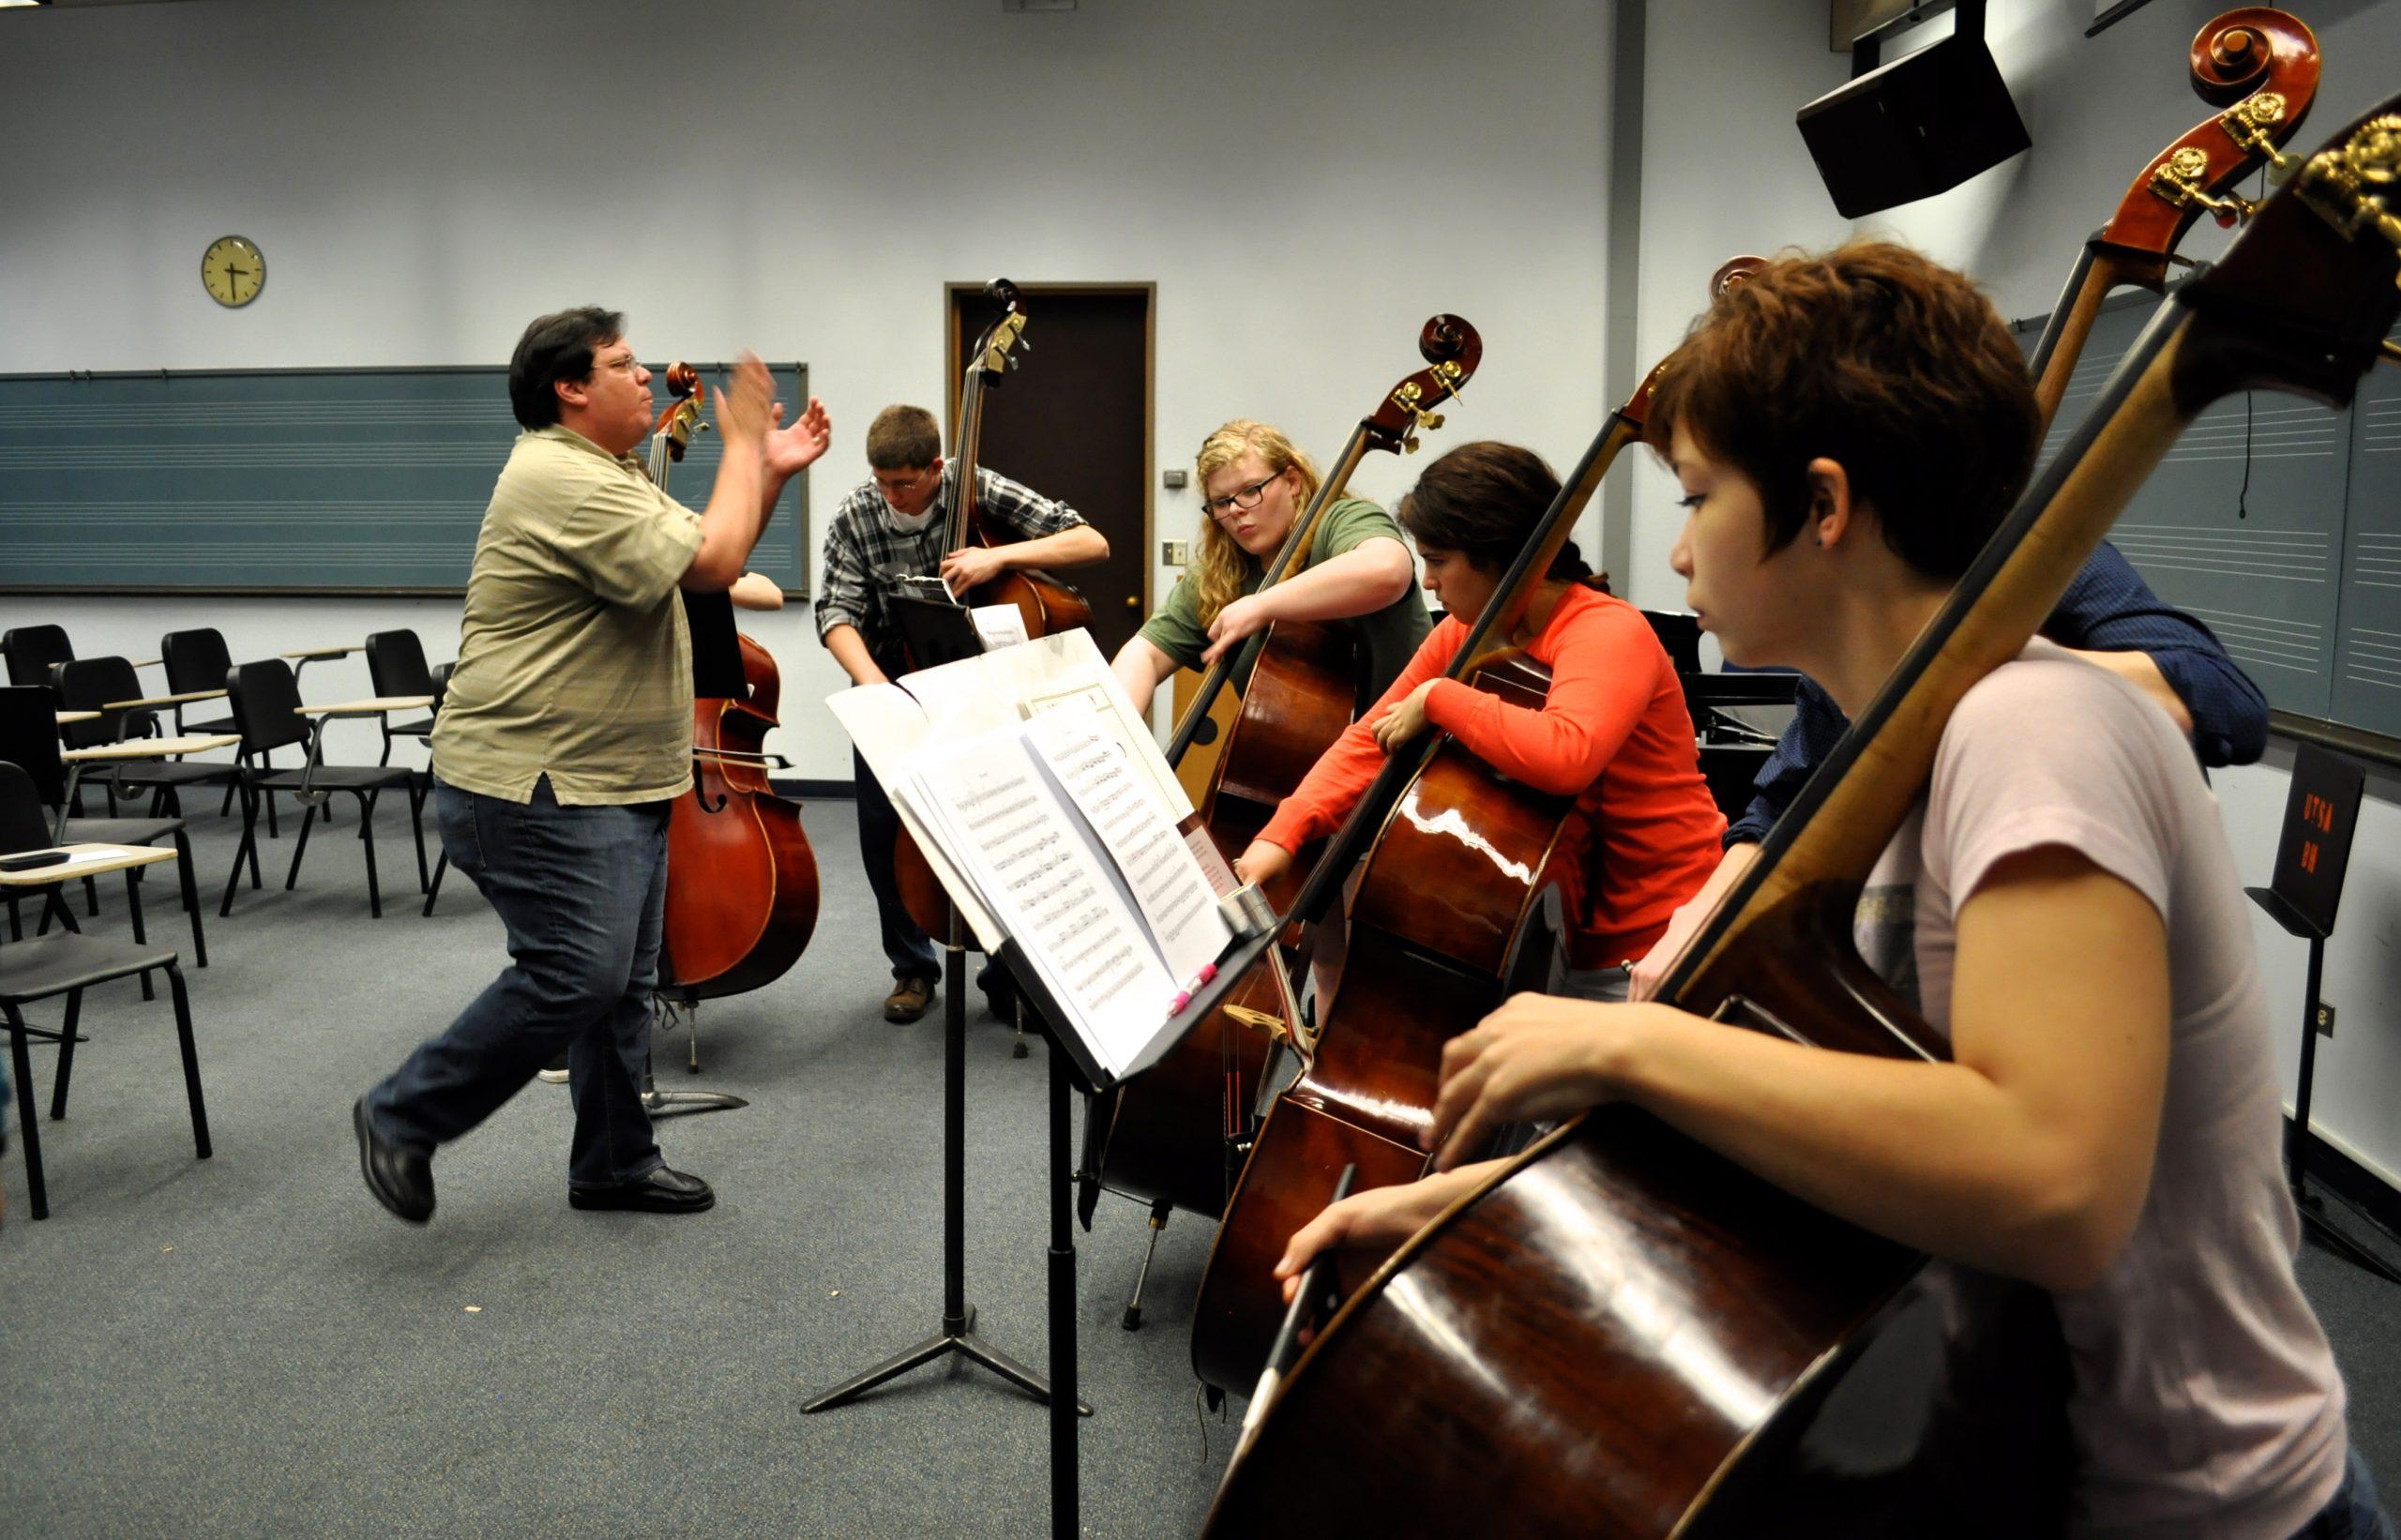 YOSA bassists rehearse at UTSA's main campus. Photo by Iris Dimmick.